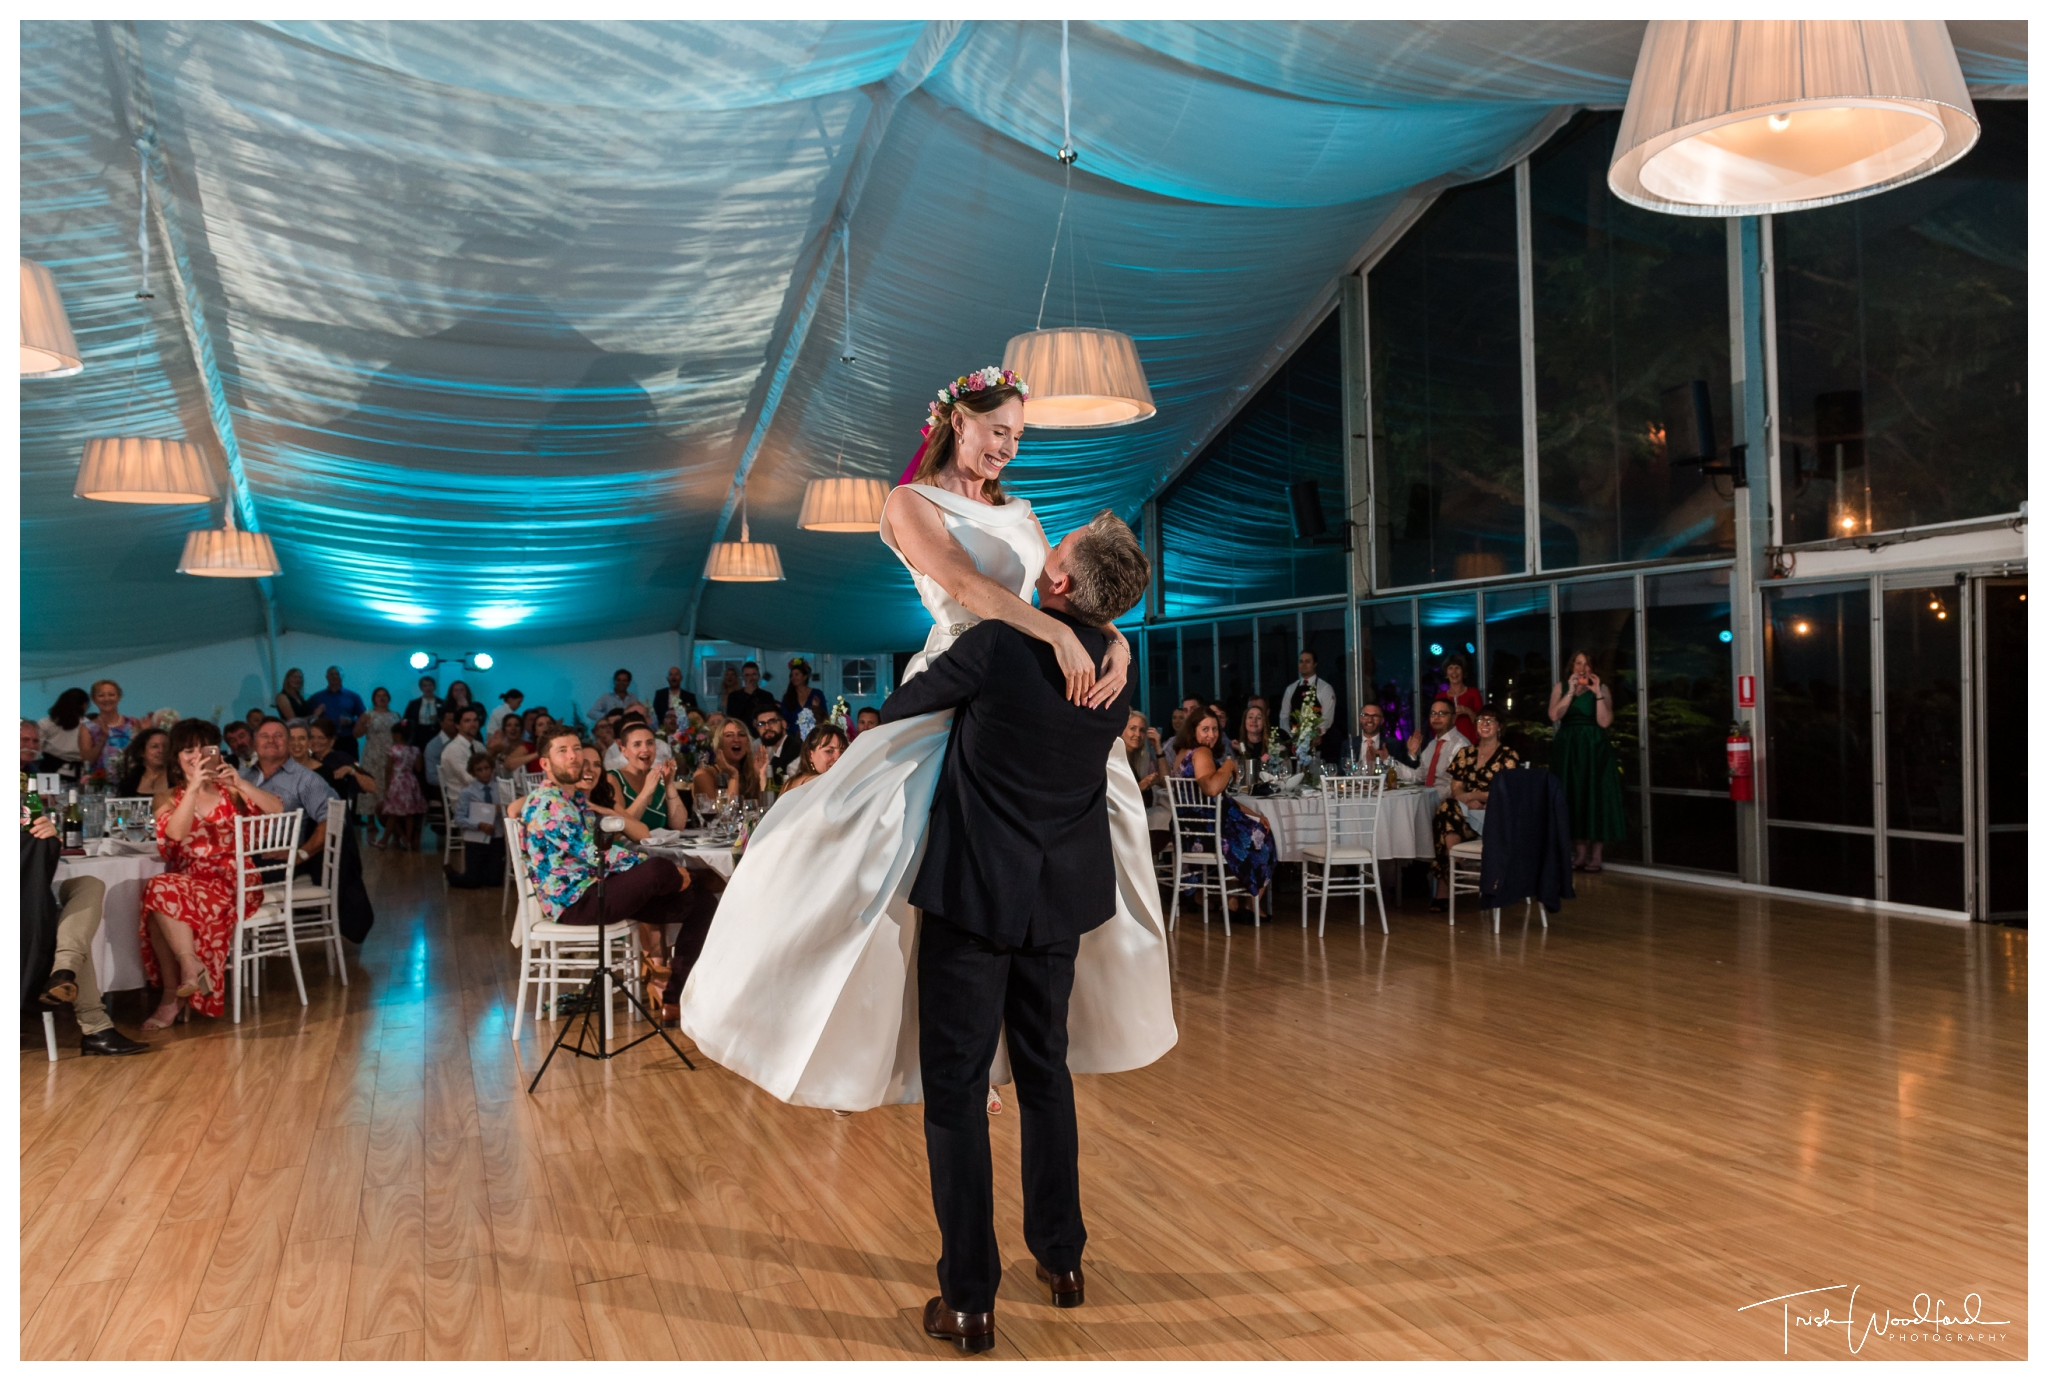 bridal-dance-perth-zoo-wedding